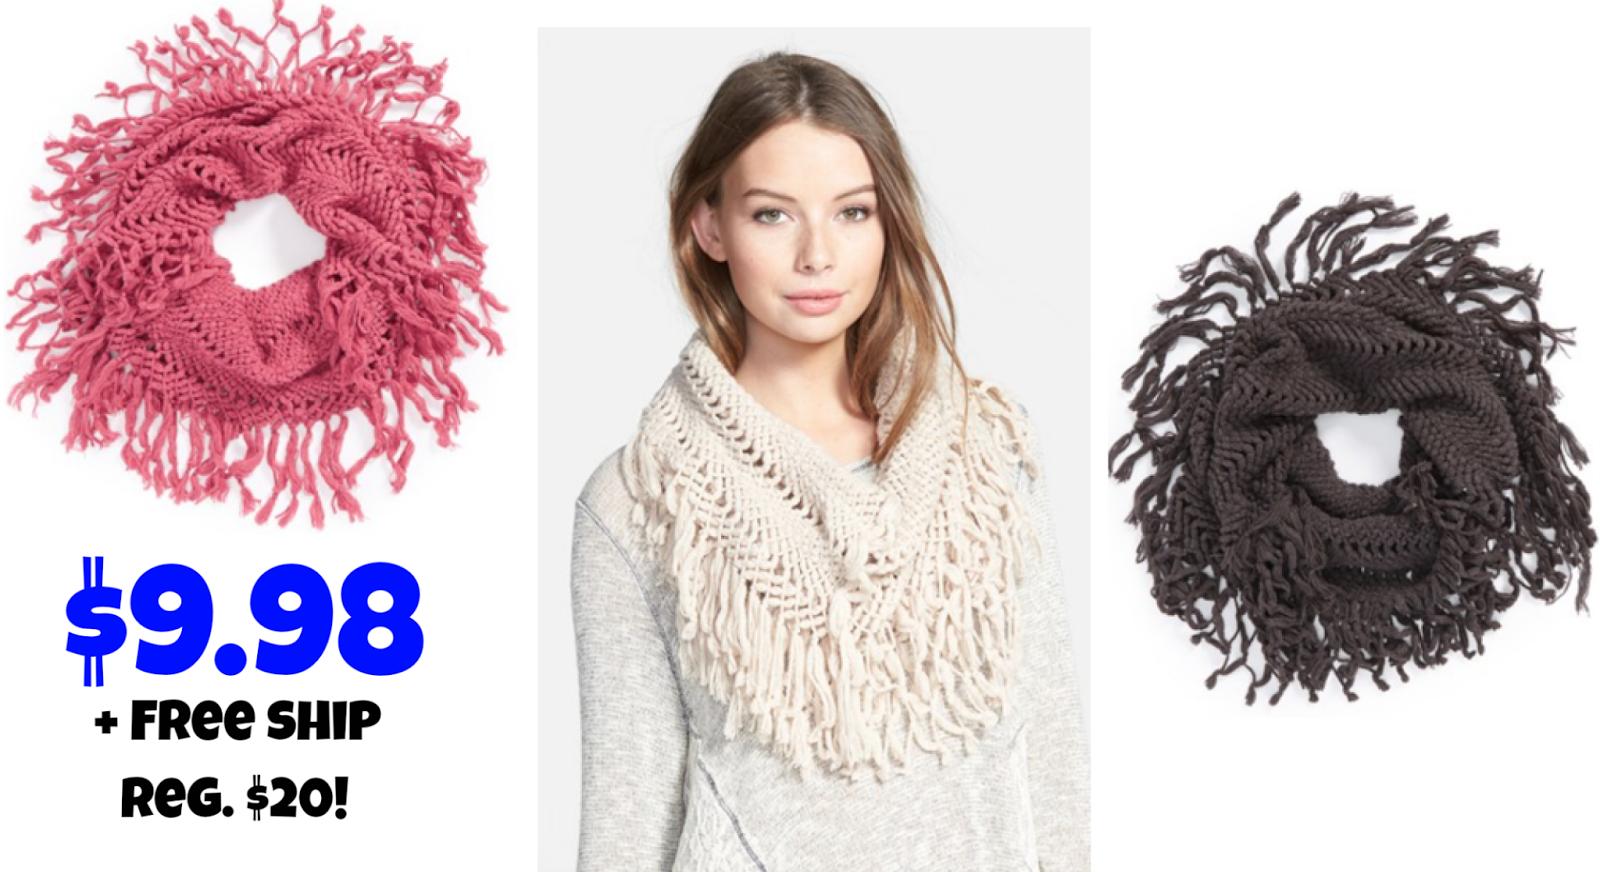 http://www.thebinderladies.com/2015/03/nordstrom-com-bp-knitted-fringe.html